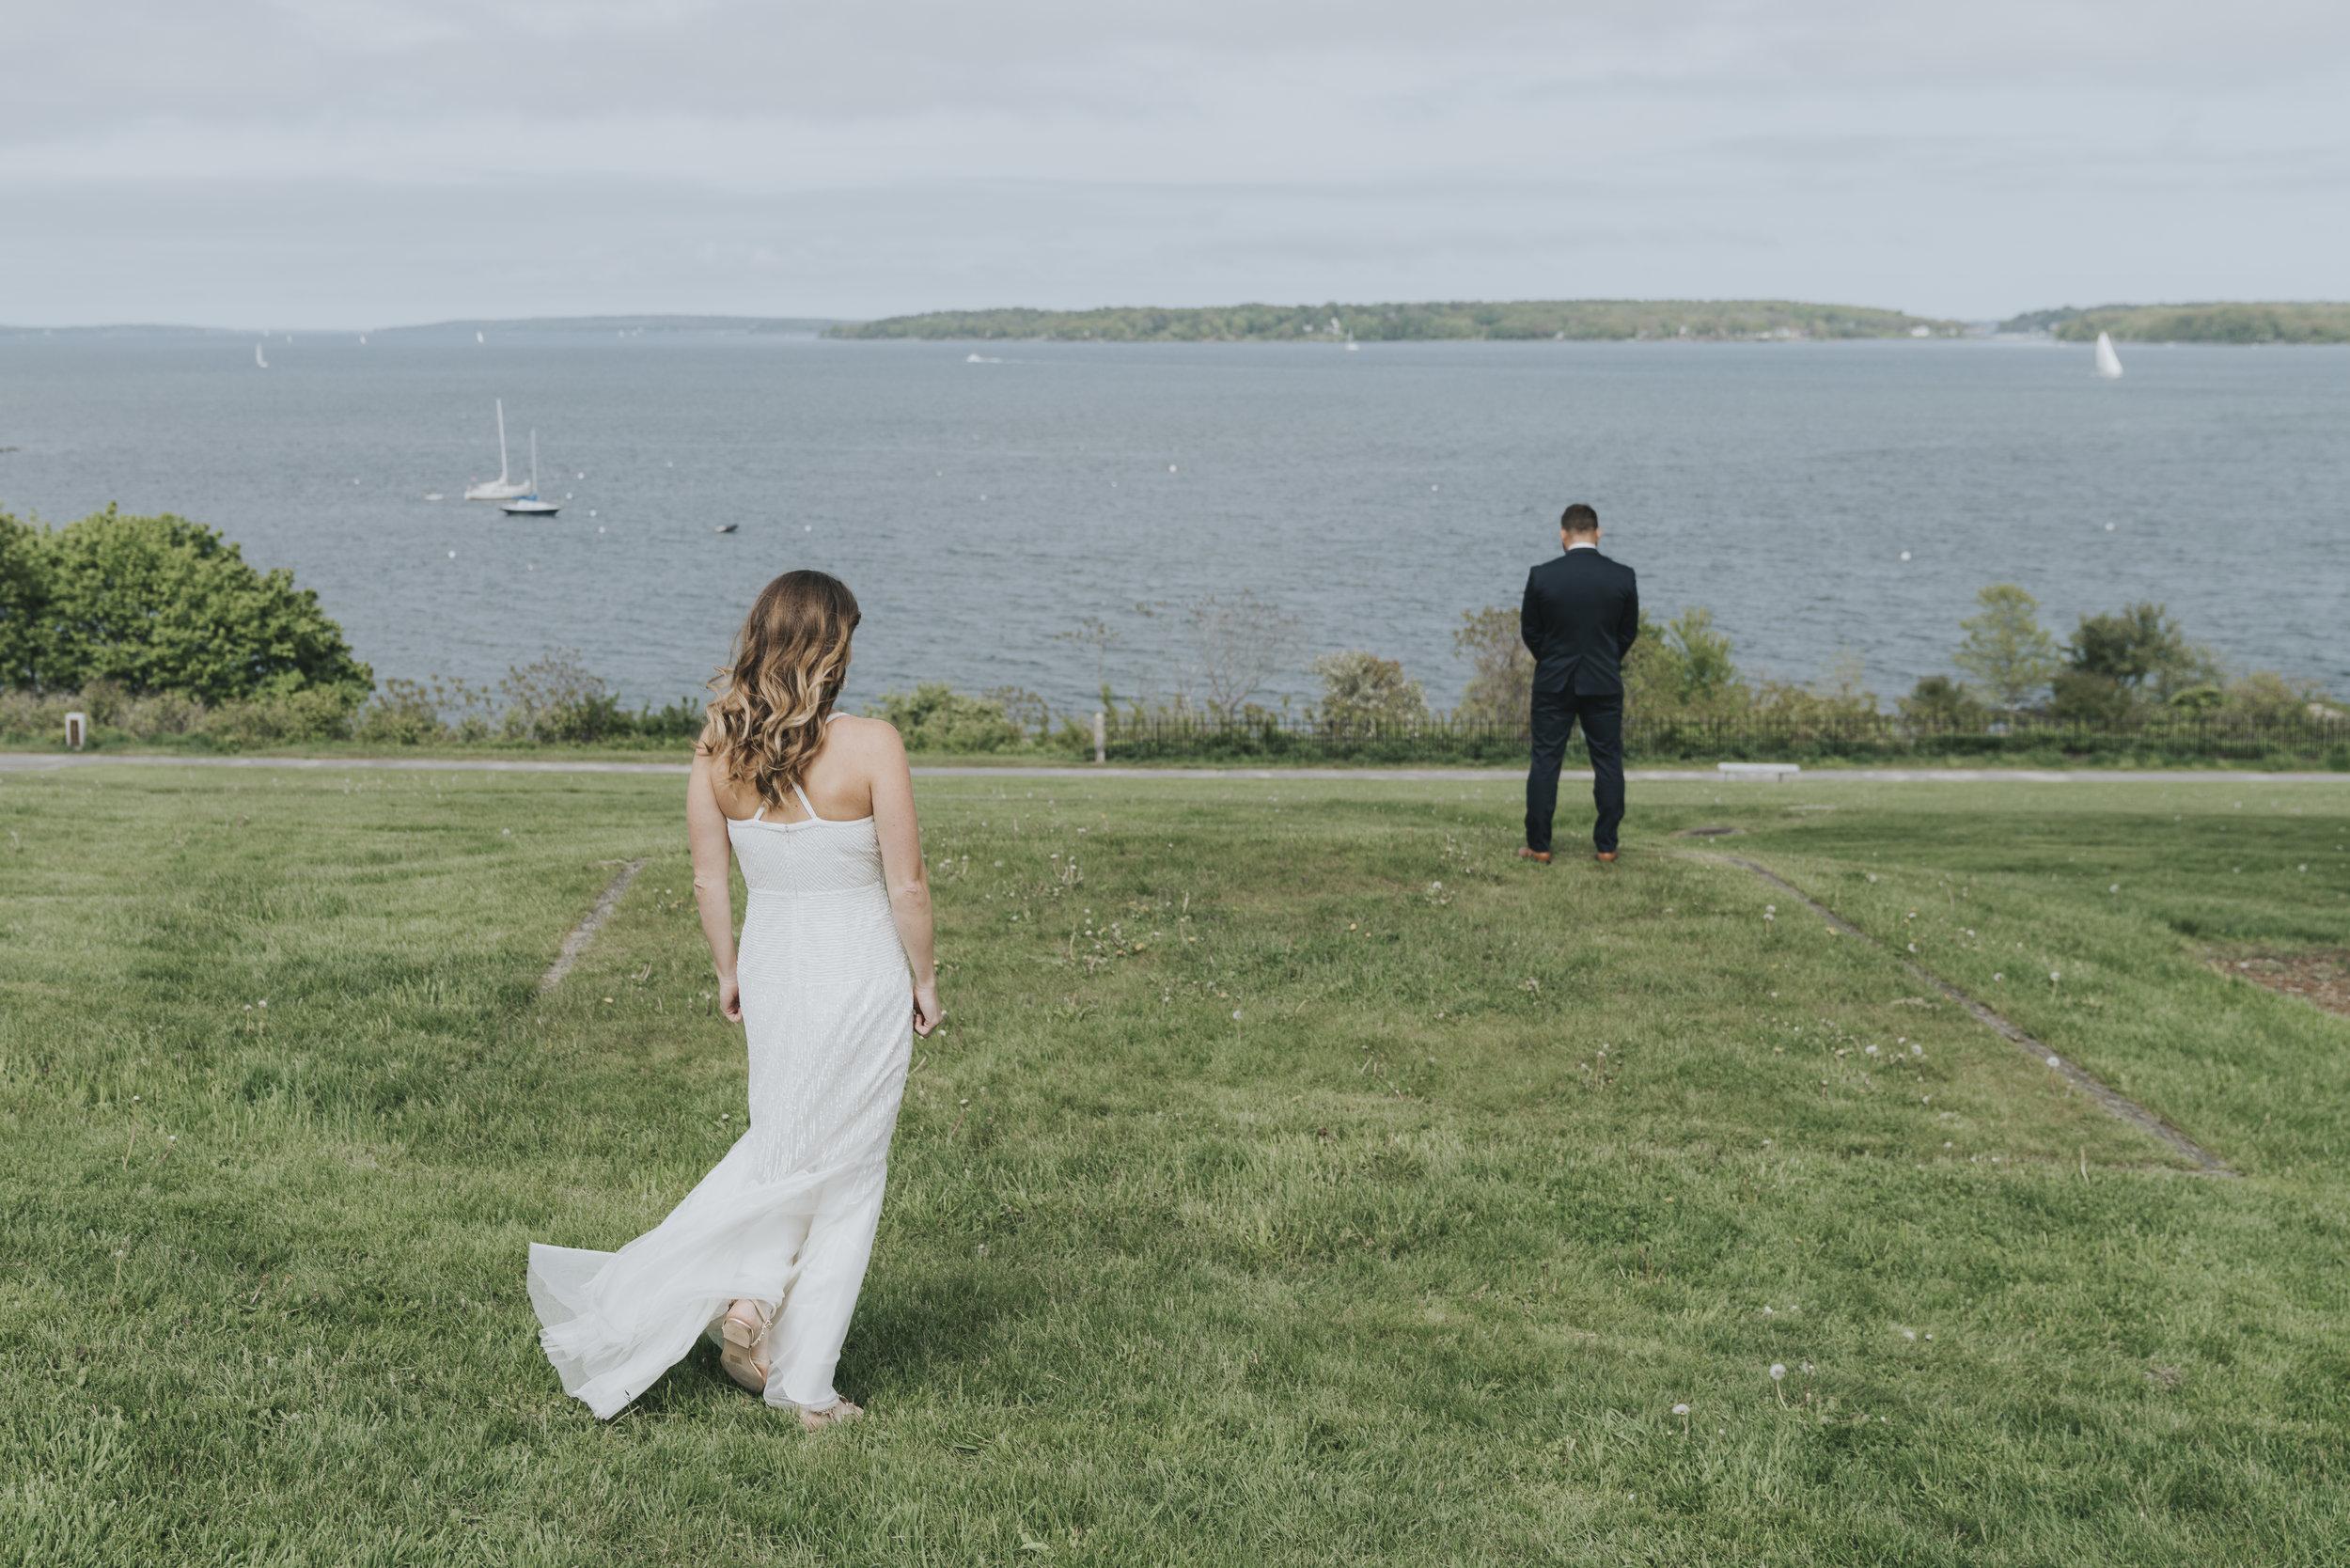 Wedding2017_Kyle&Maria_C2_5.28.17_JPGs (37 of 83).jpg